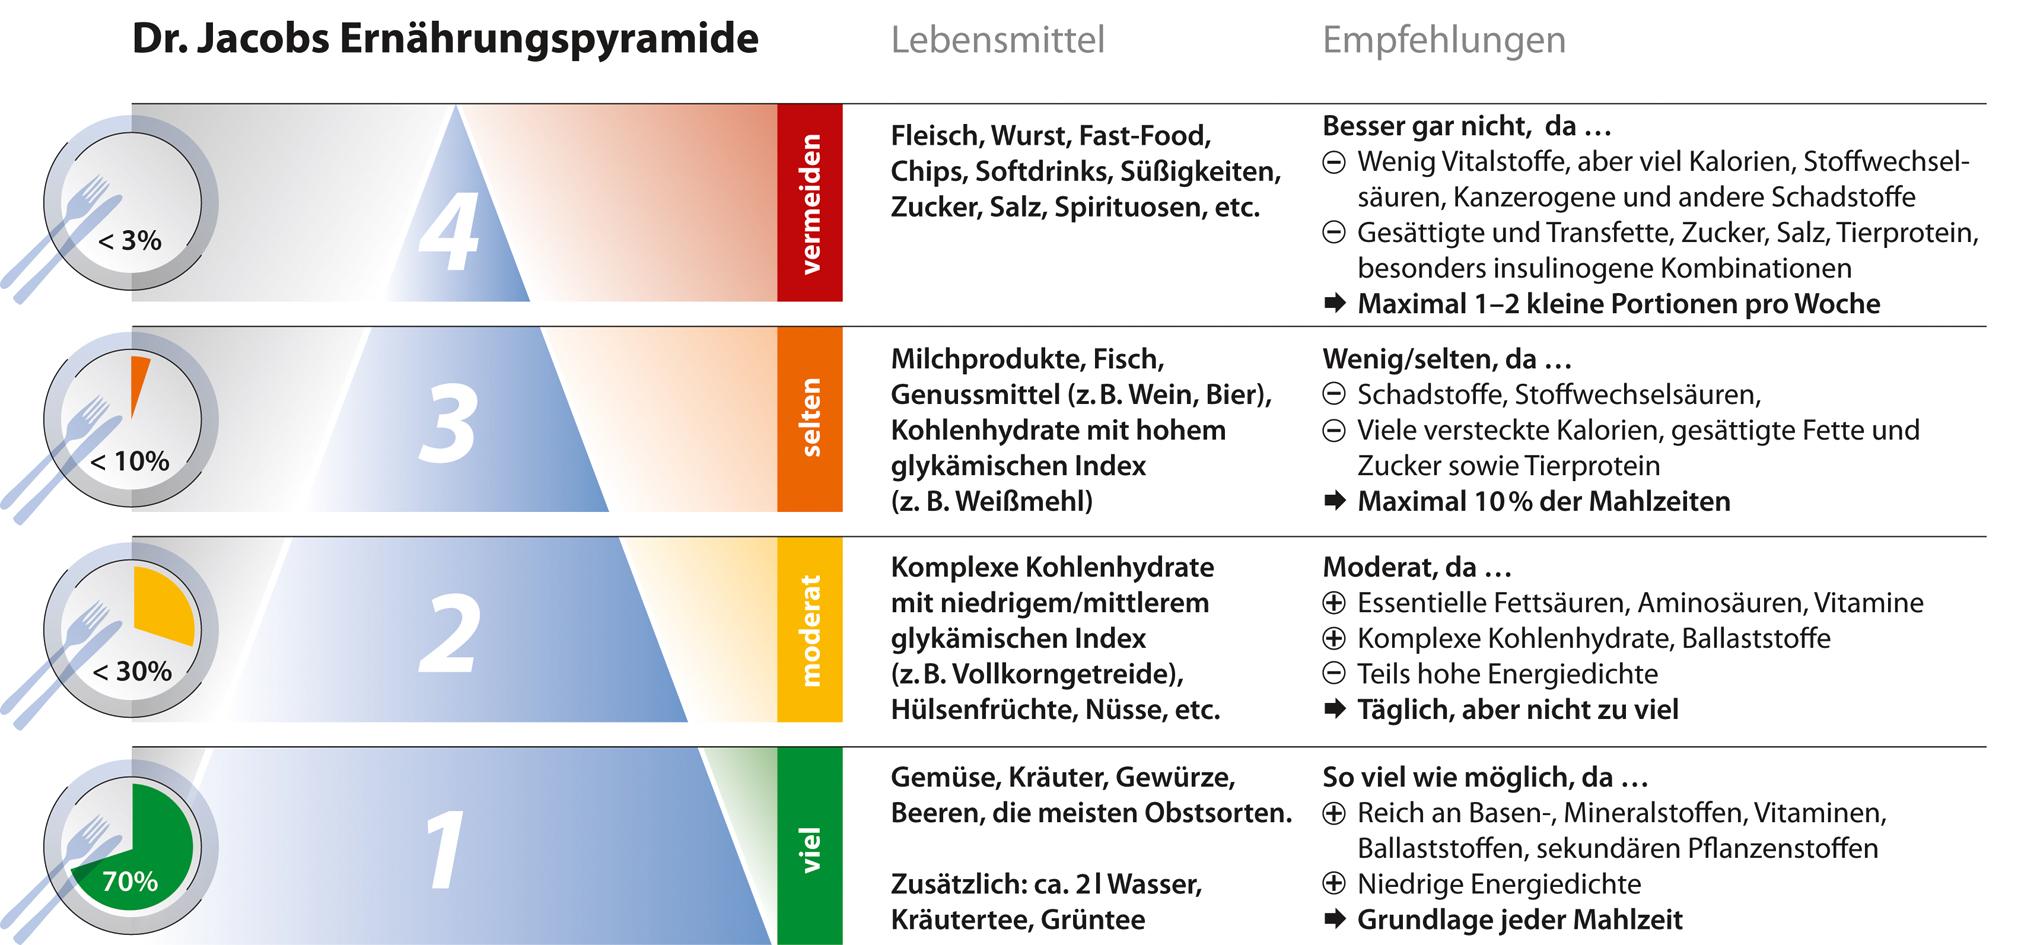 Dr. Jacobs Ernährungspyramide